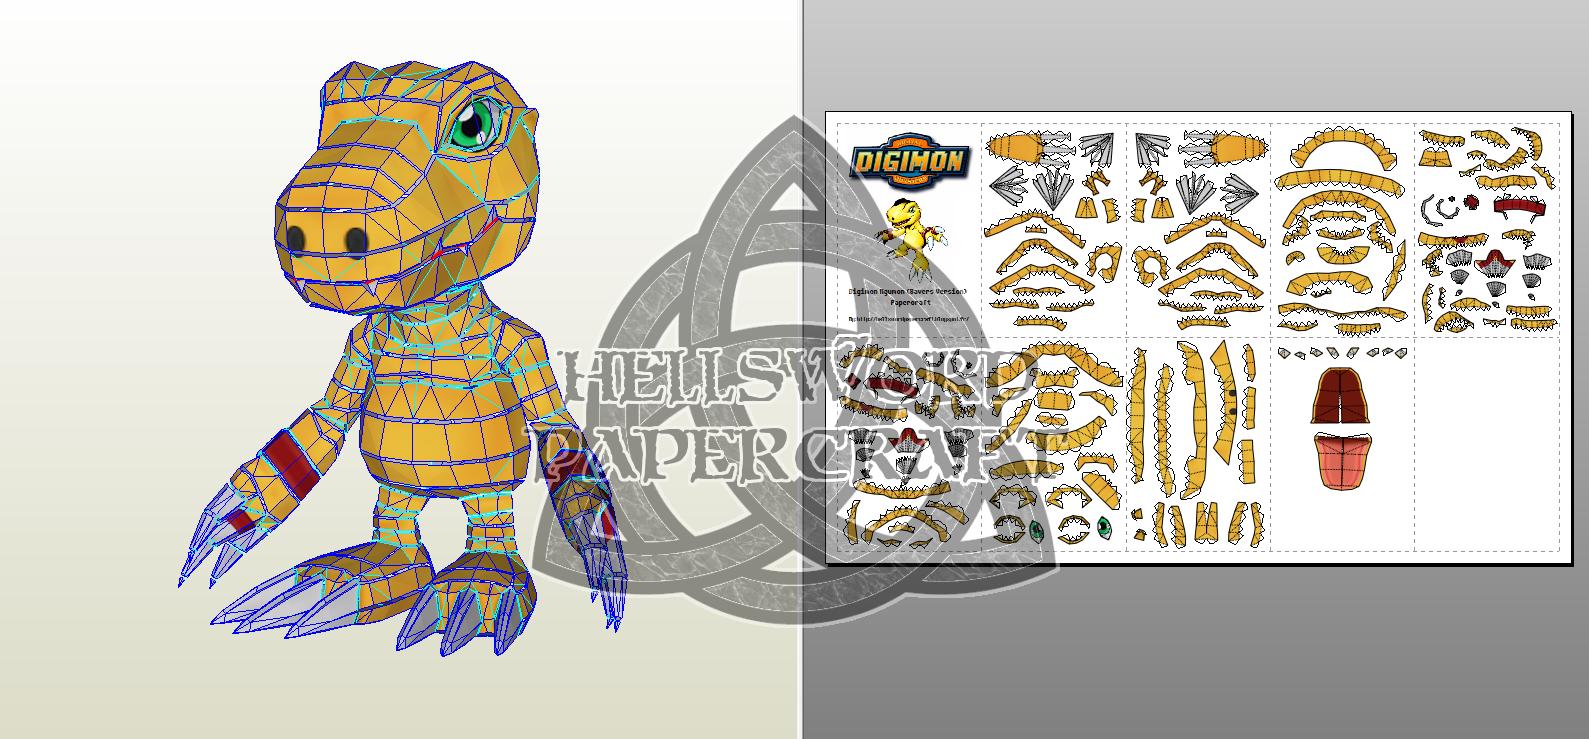 hellsword papercraft digimon agumon savers version papercraft